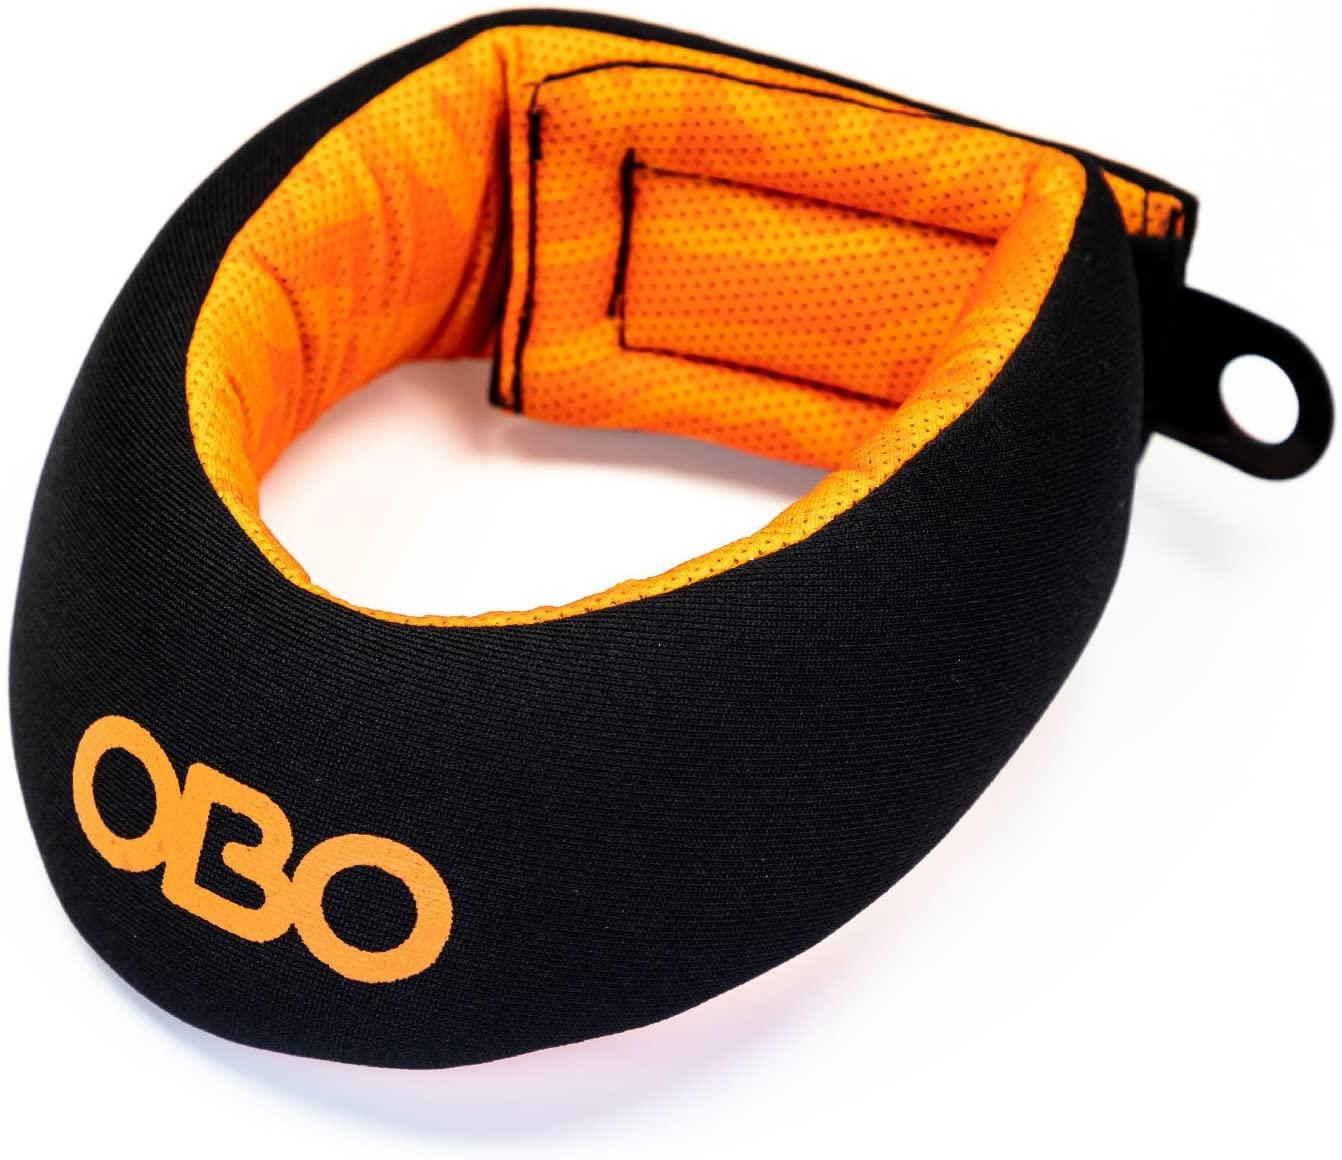 OBO Cloud Field Hockey Throat Protector